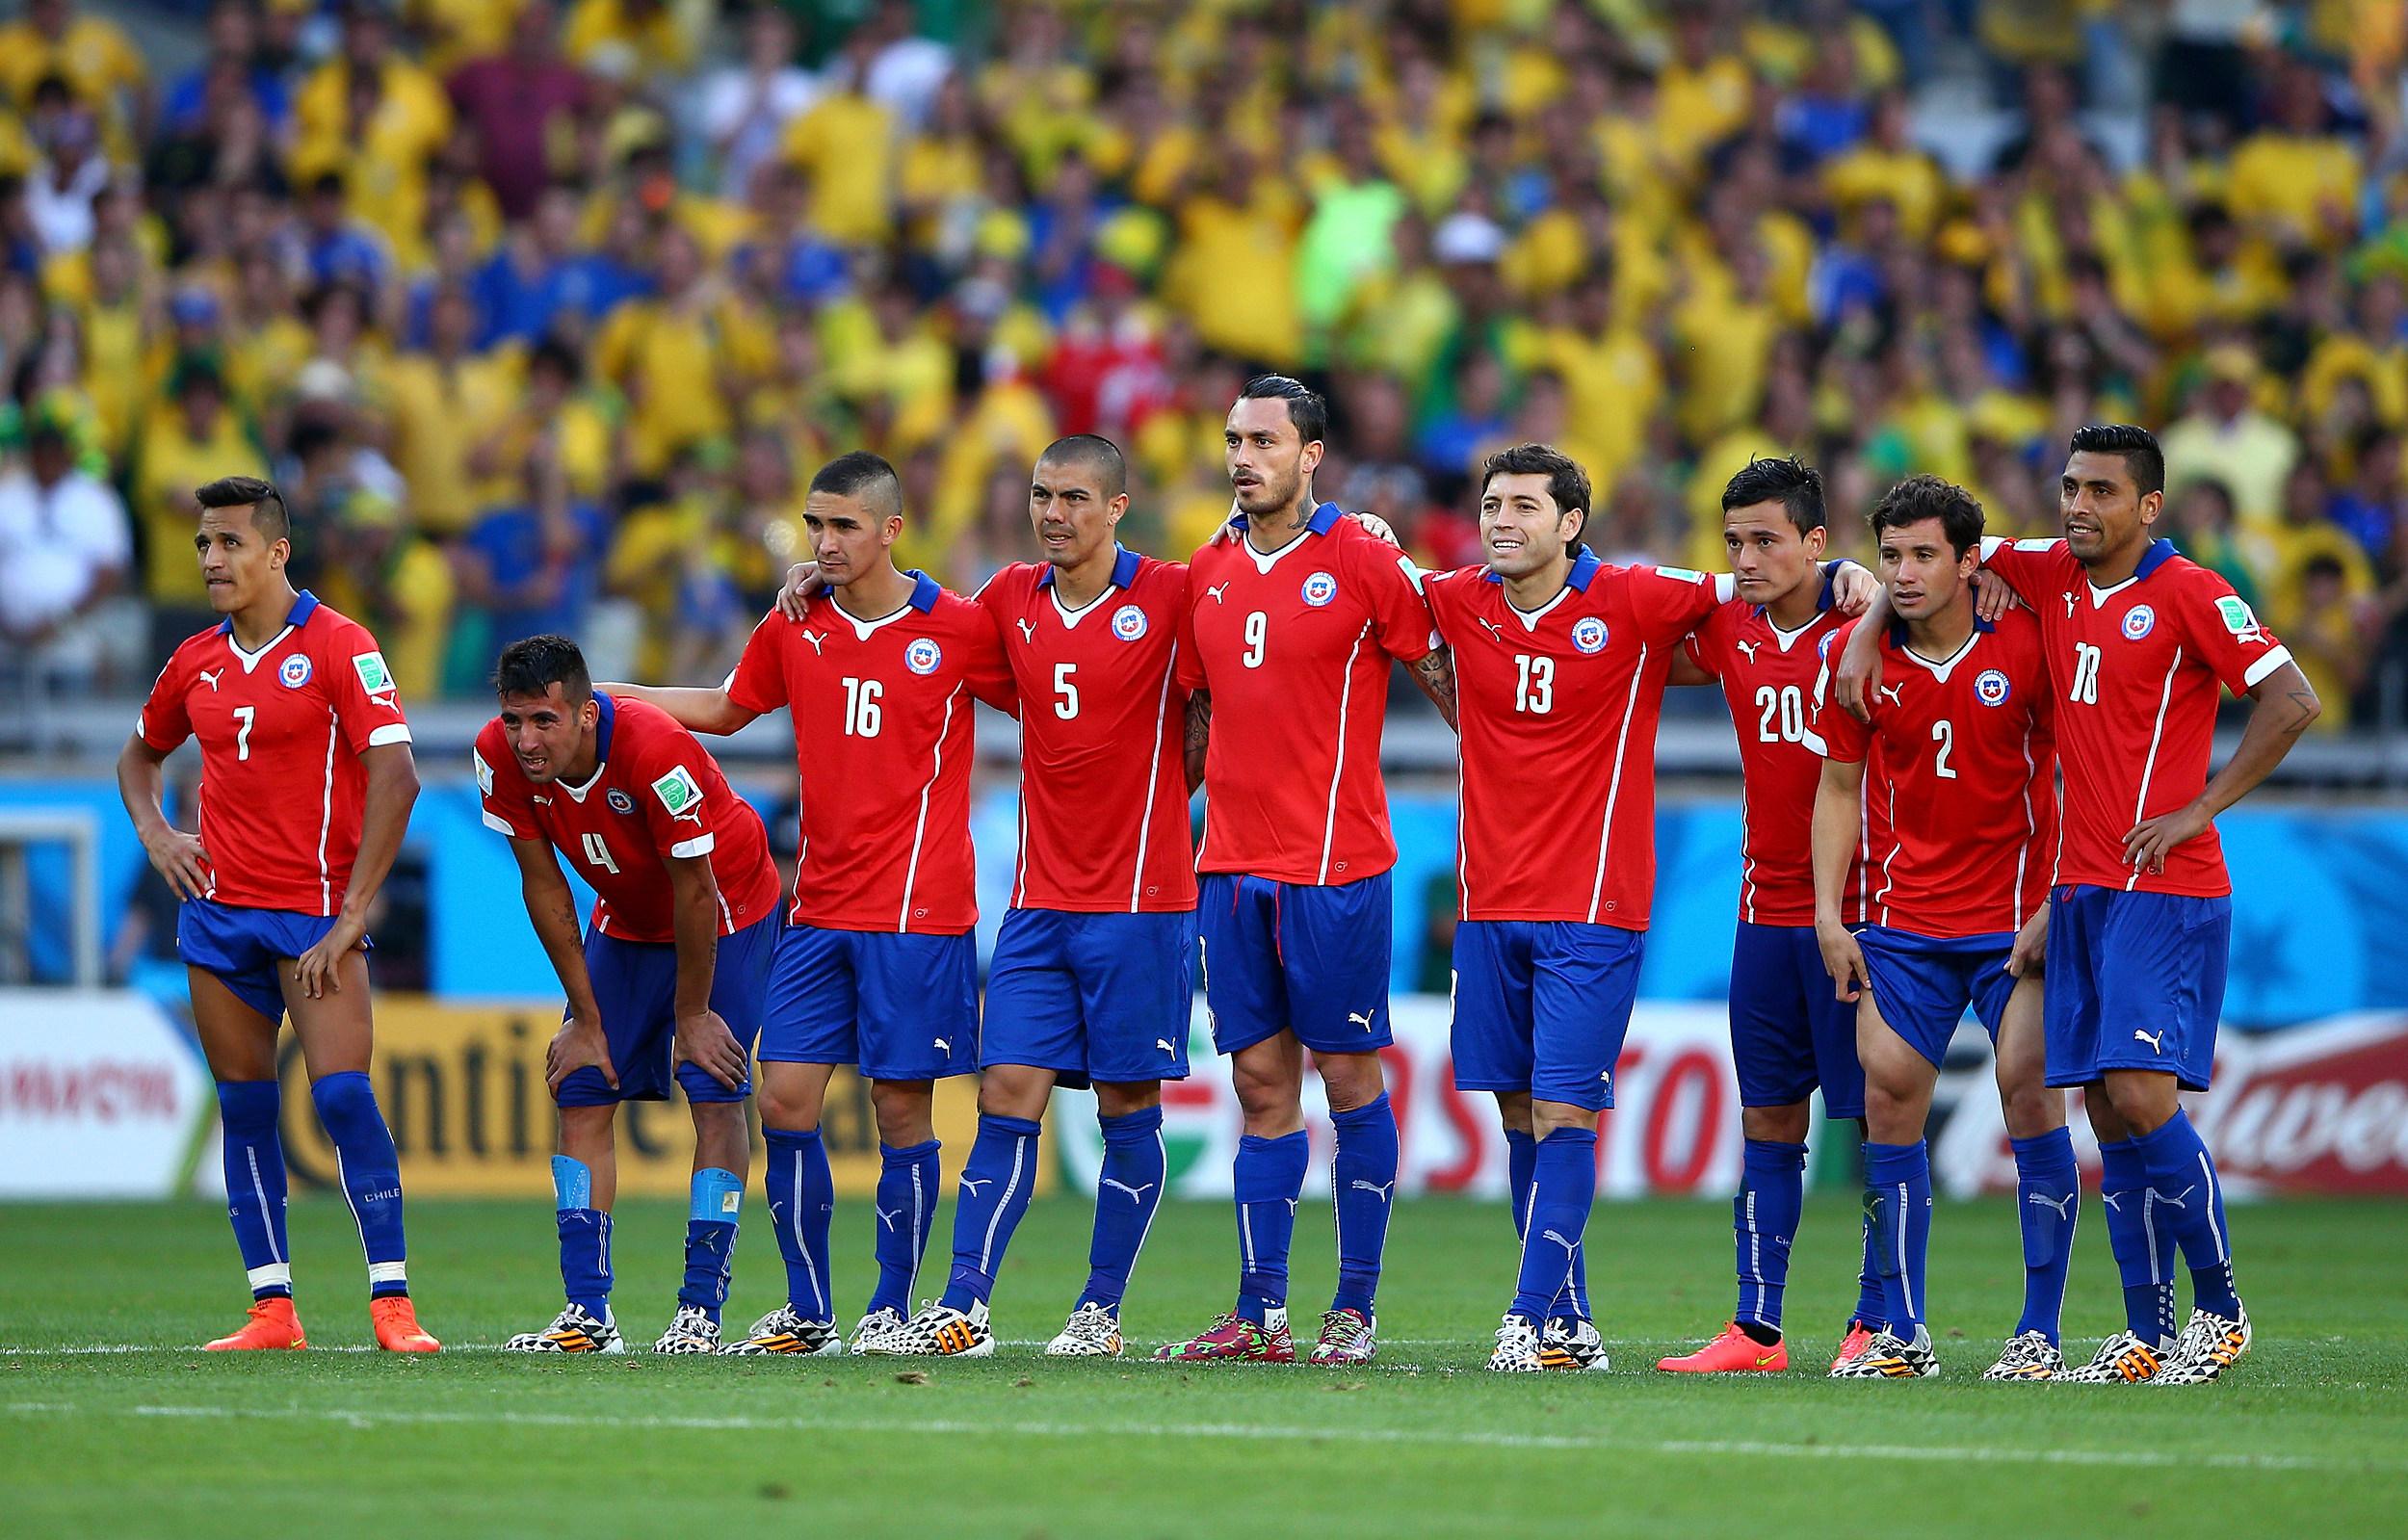 Chilean Soccer Team 2014 | www.imgkid.com - The Image Kid ...